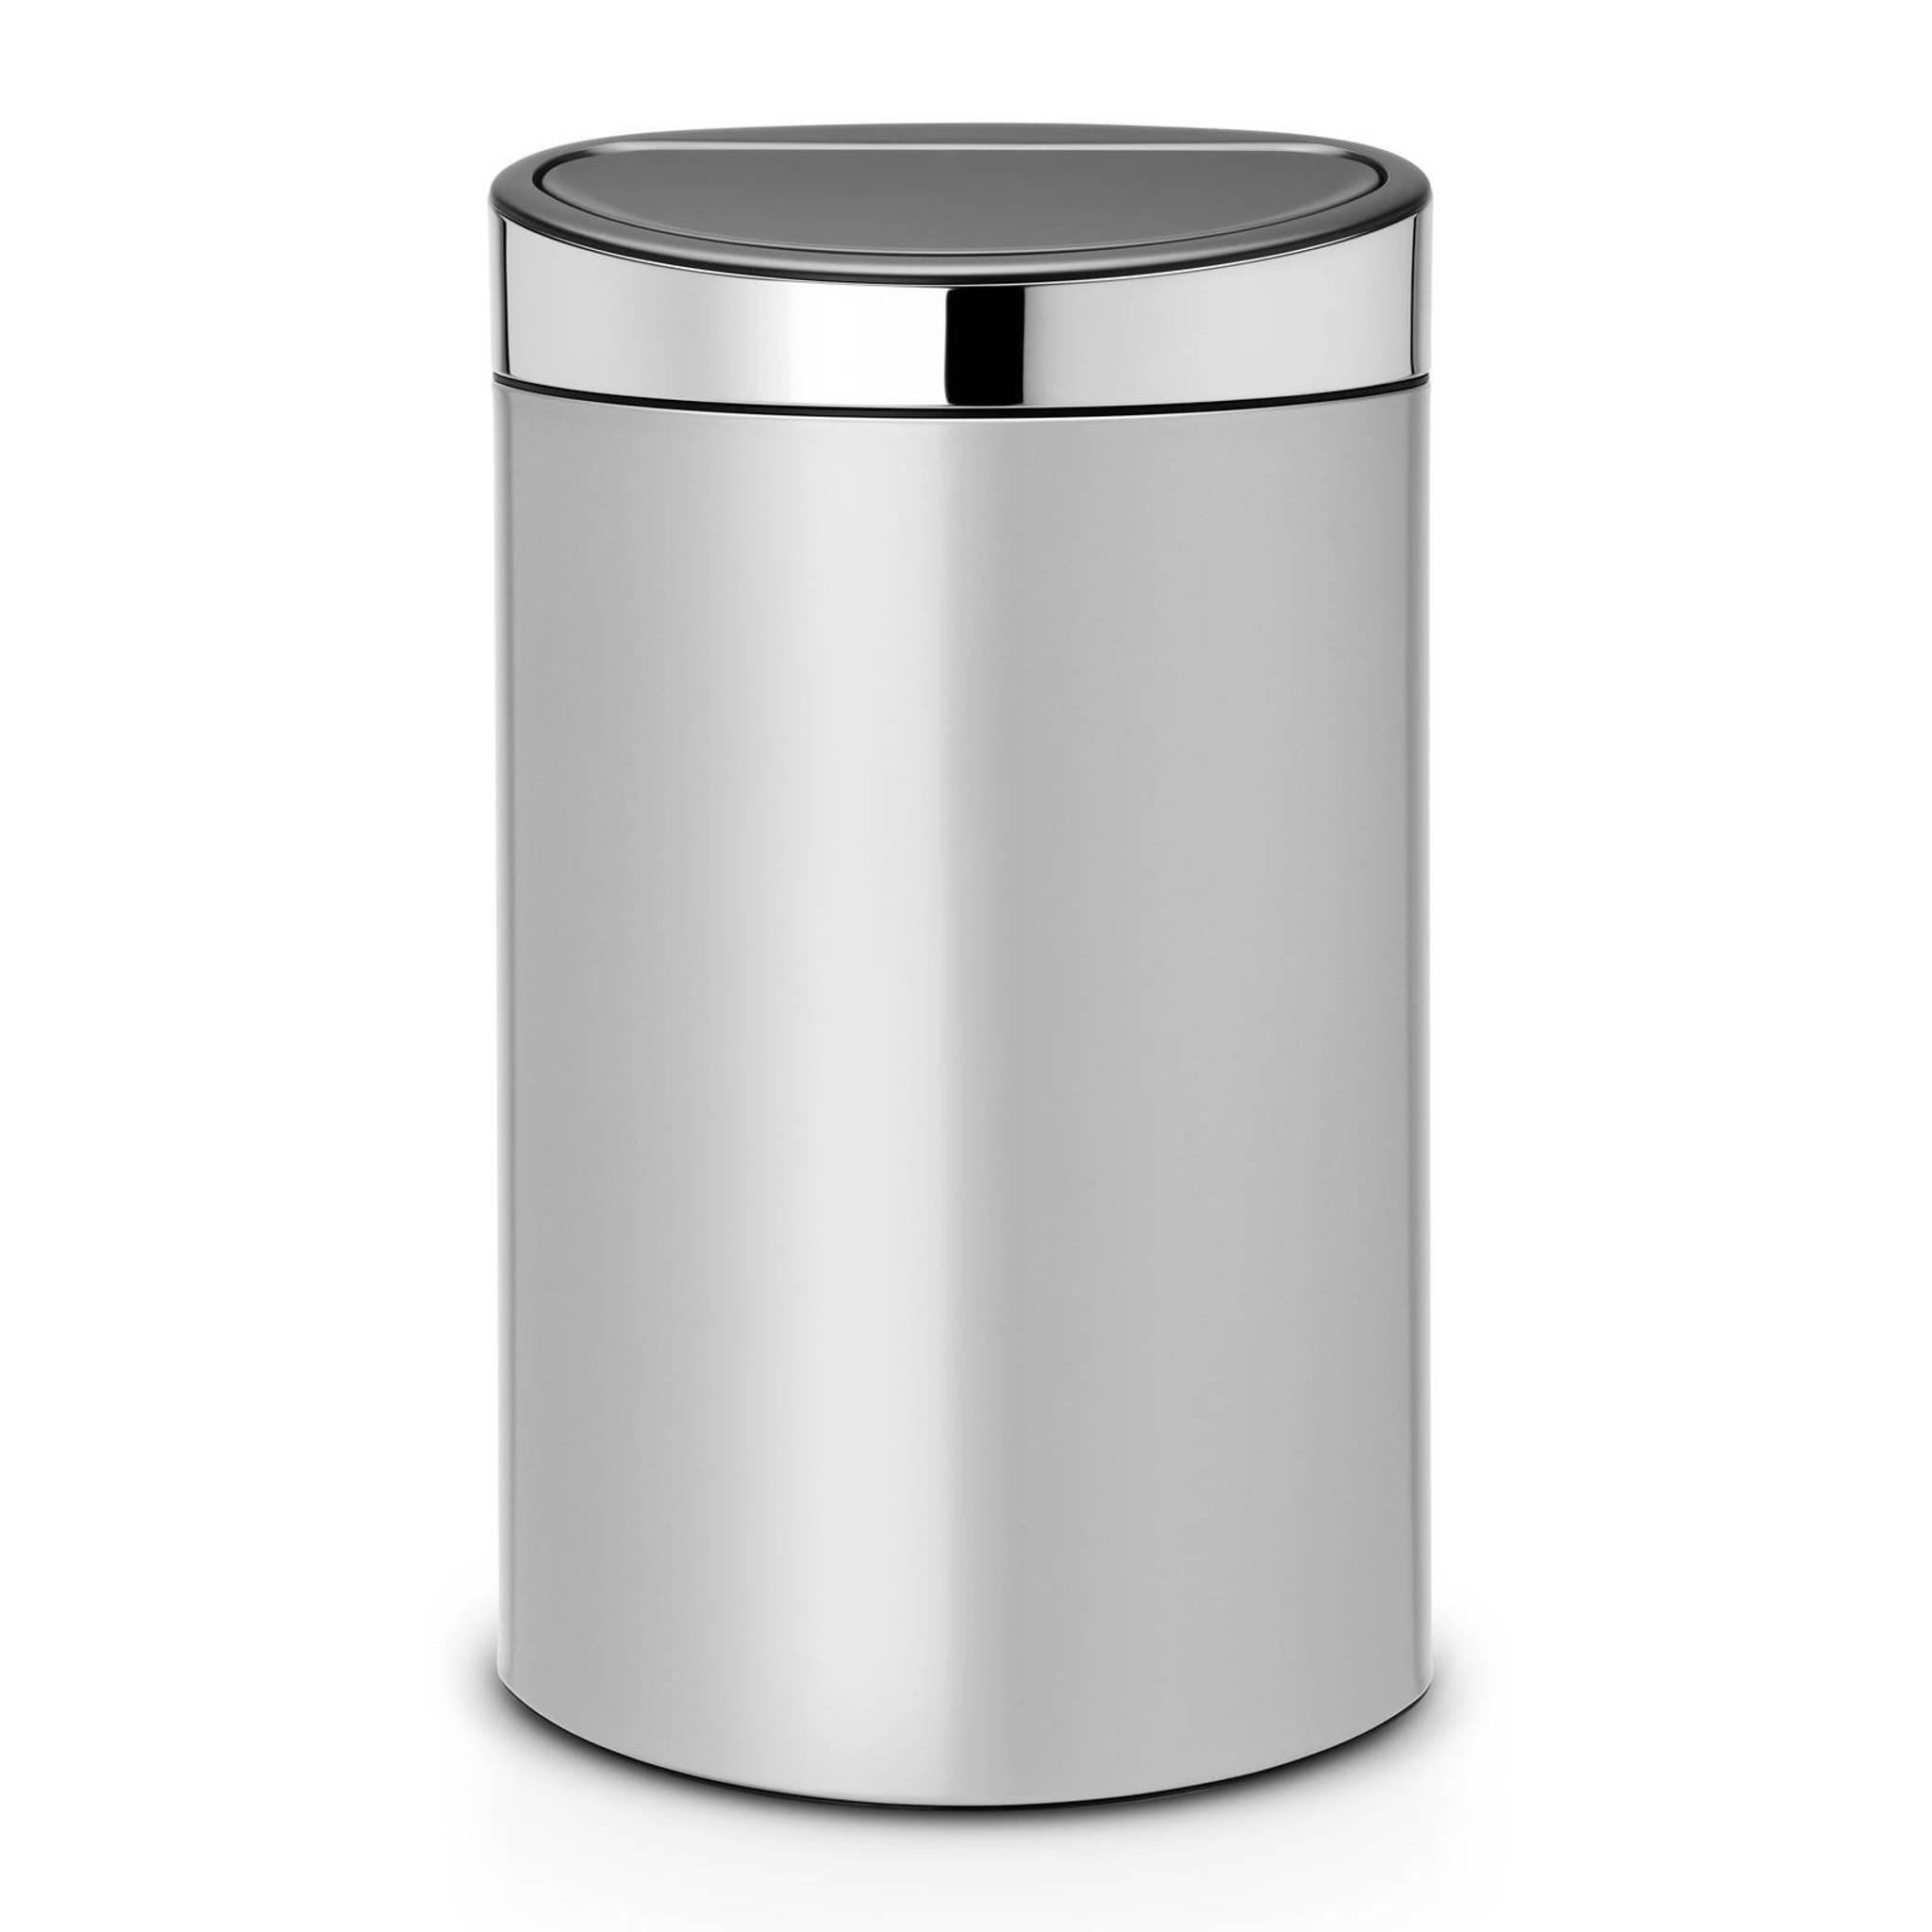 Garantie Brabantia Touch Bin 40 Liter.Touch Bin Prullenbak 40 Liter